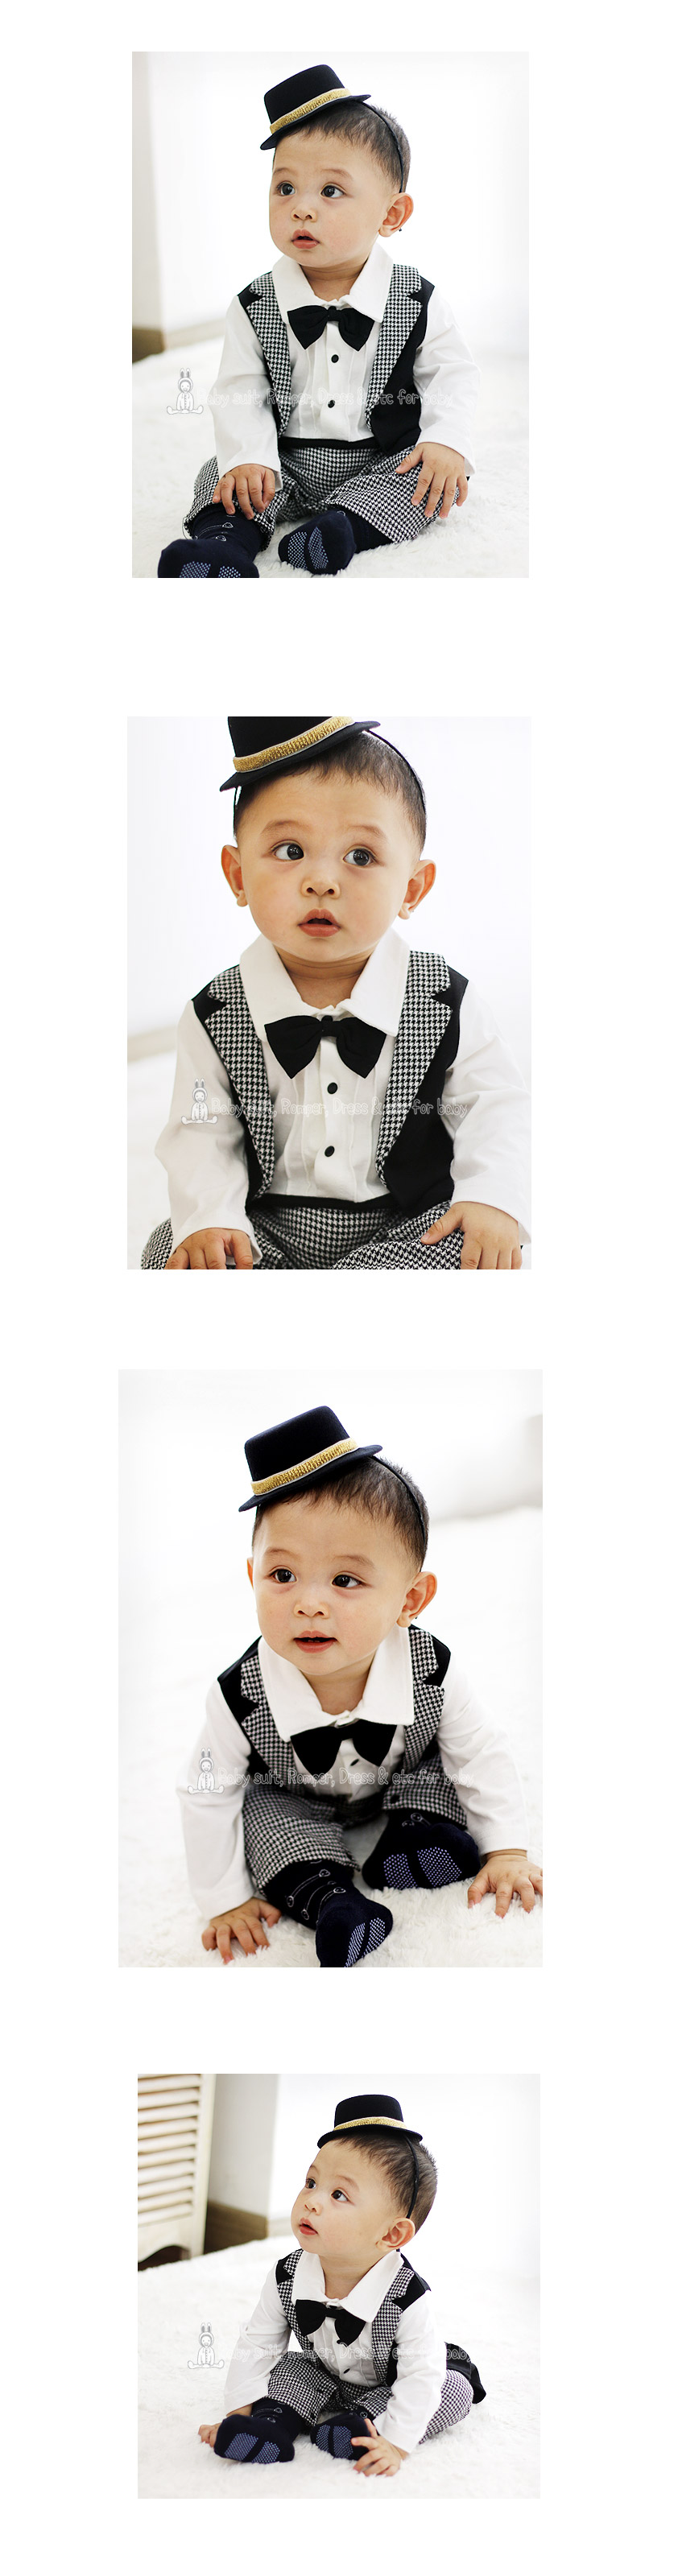 [ BABYMAX ] 1267 Oscar Tuxedo / A hundred days baby tuxedo suit